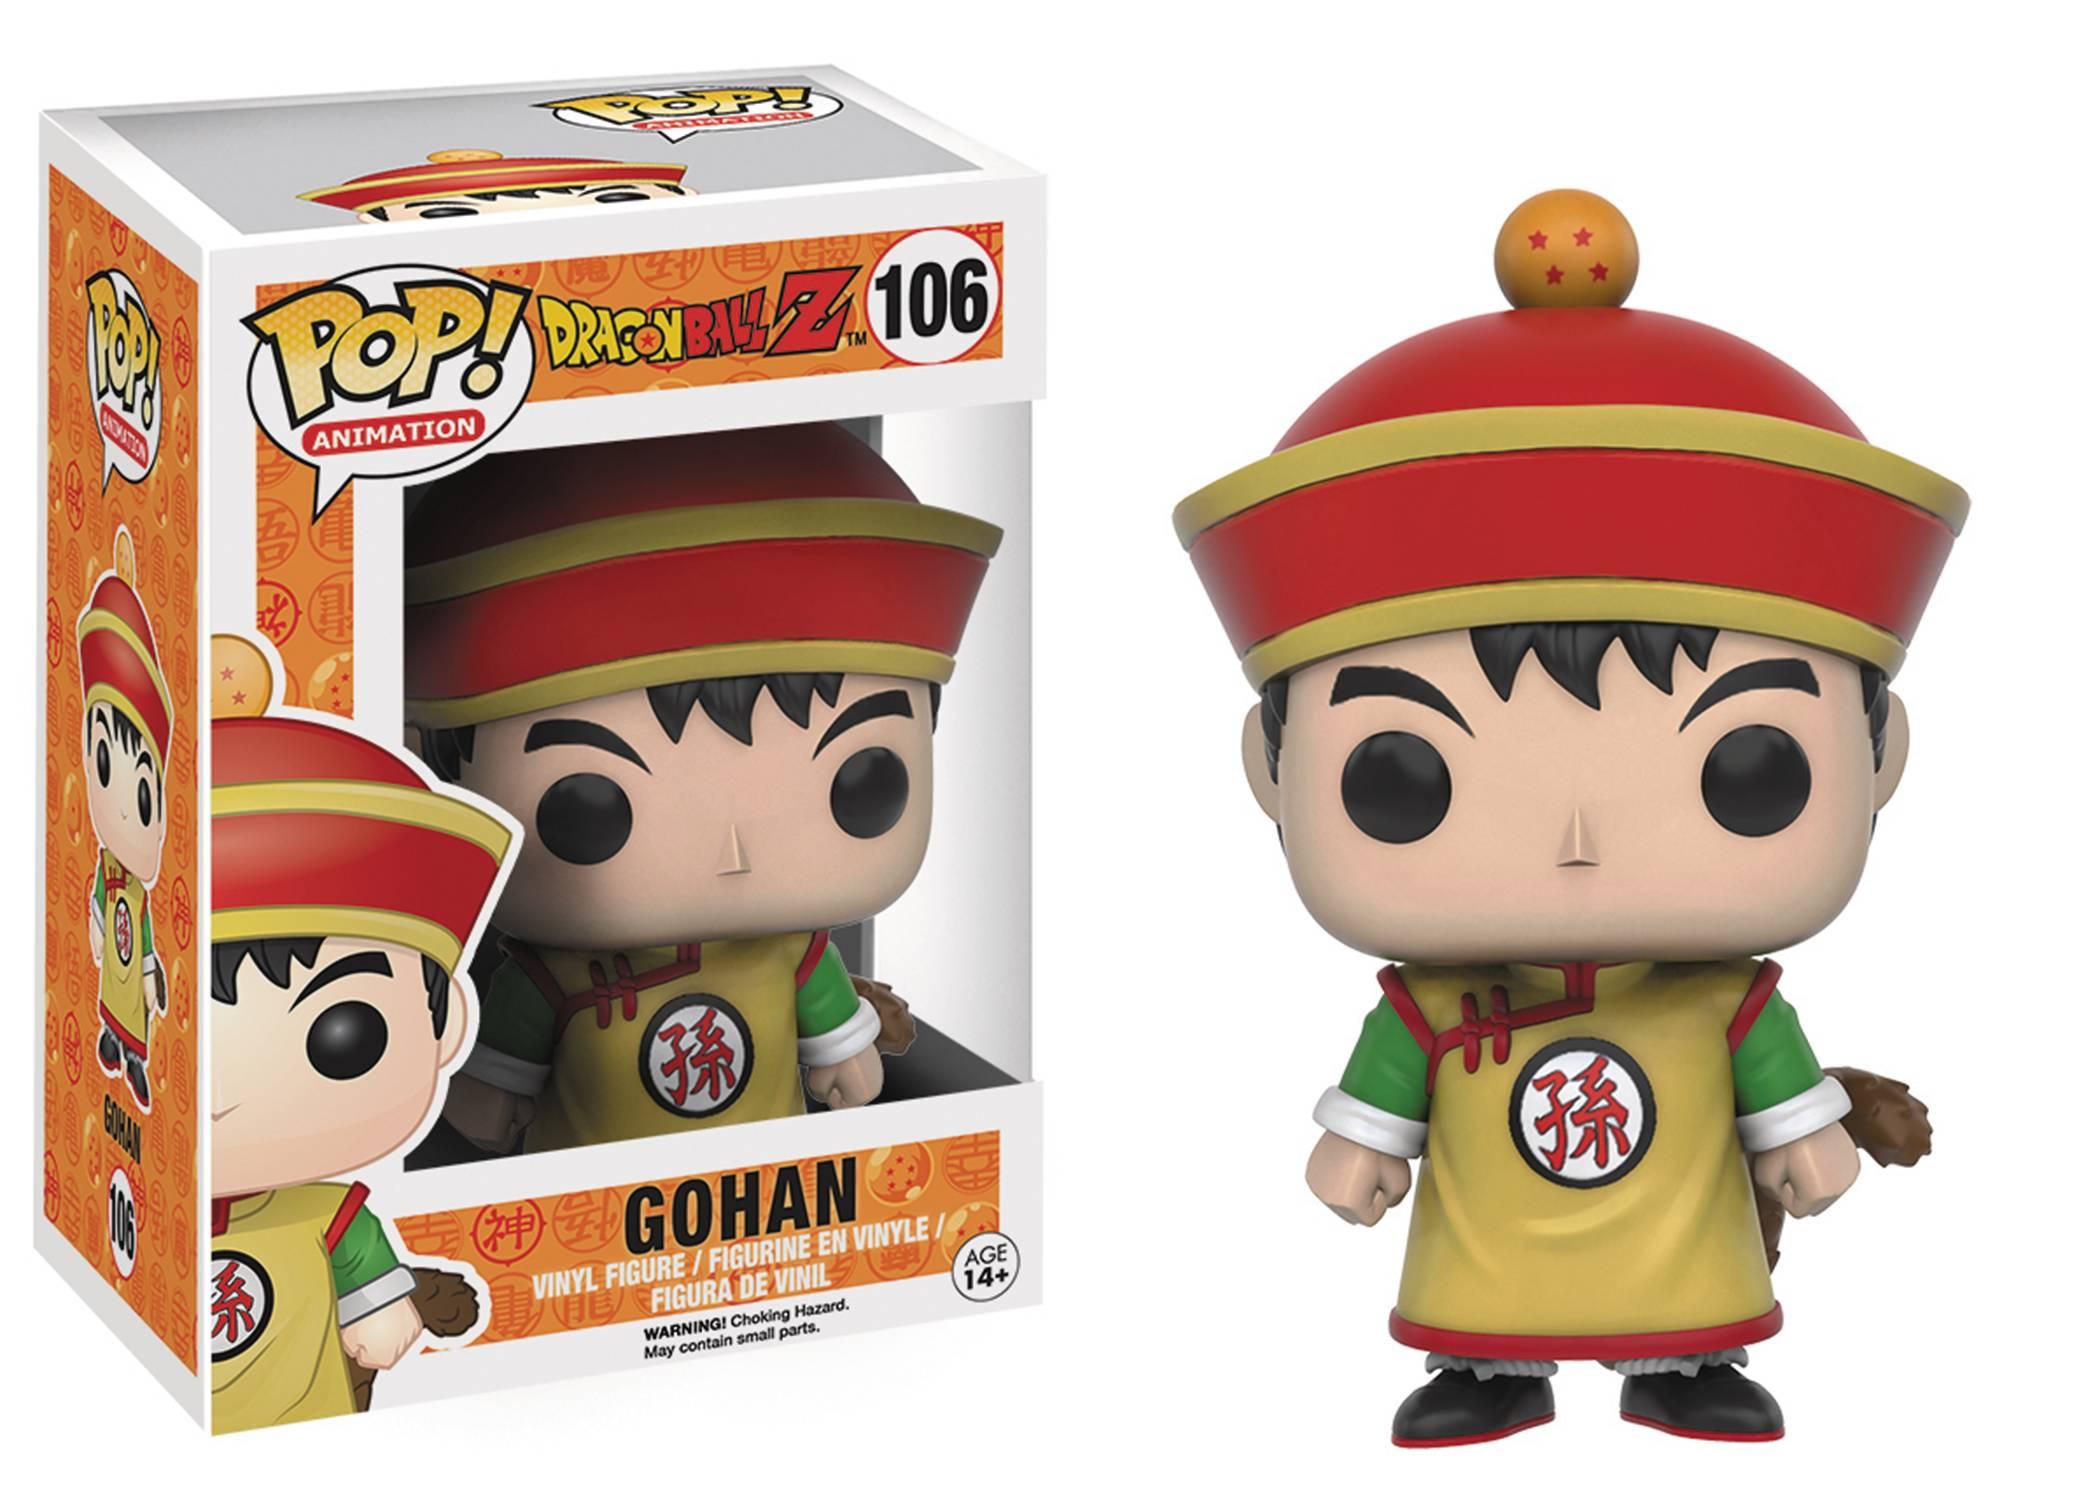 Gohan Dragonball Z POP Figure 849803074241